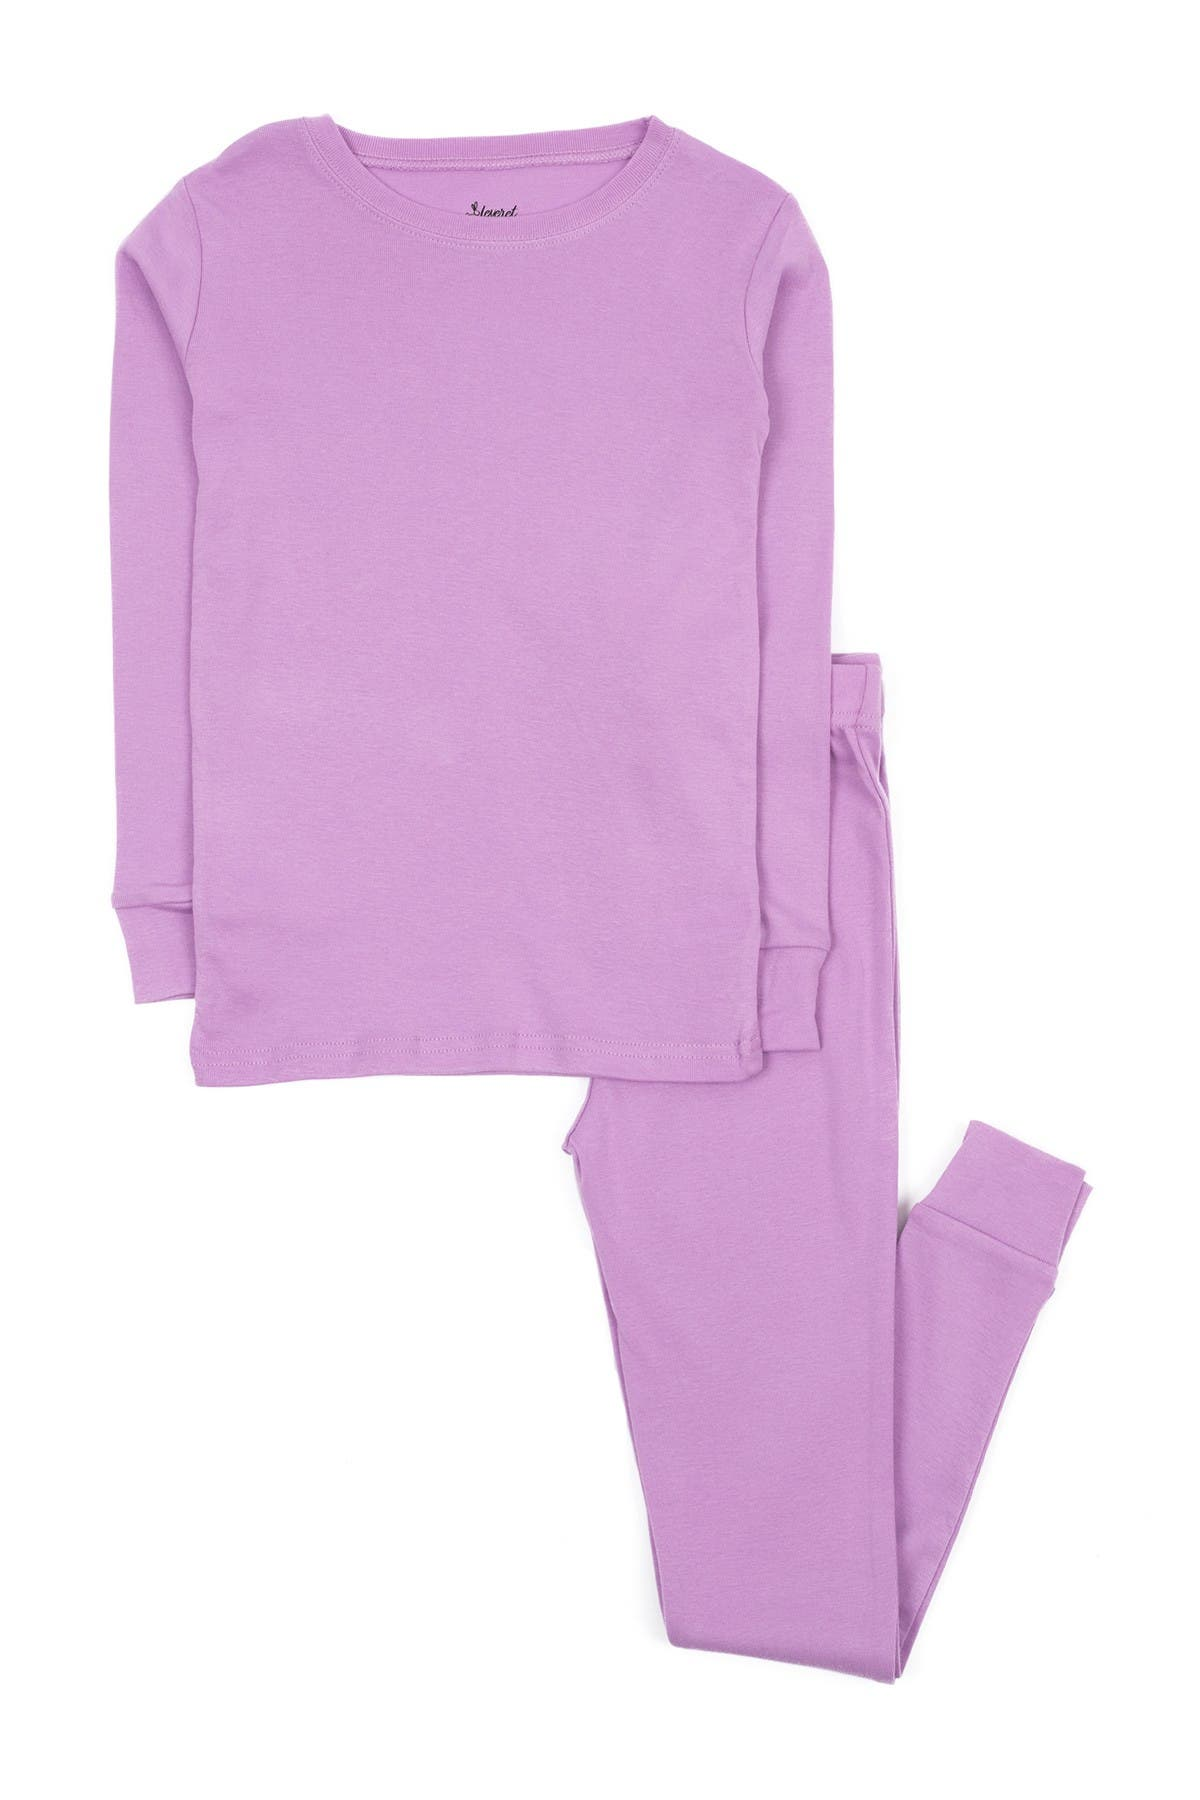 Image of Leveret Purple Two-Piece Cotton Pajamas